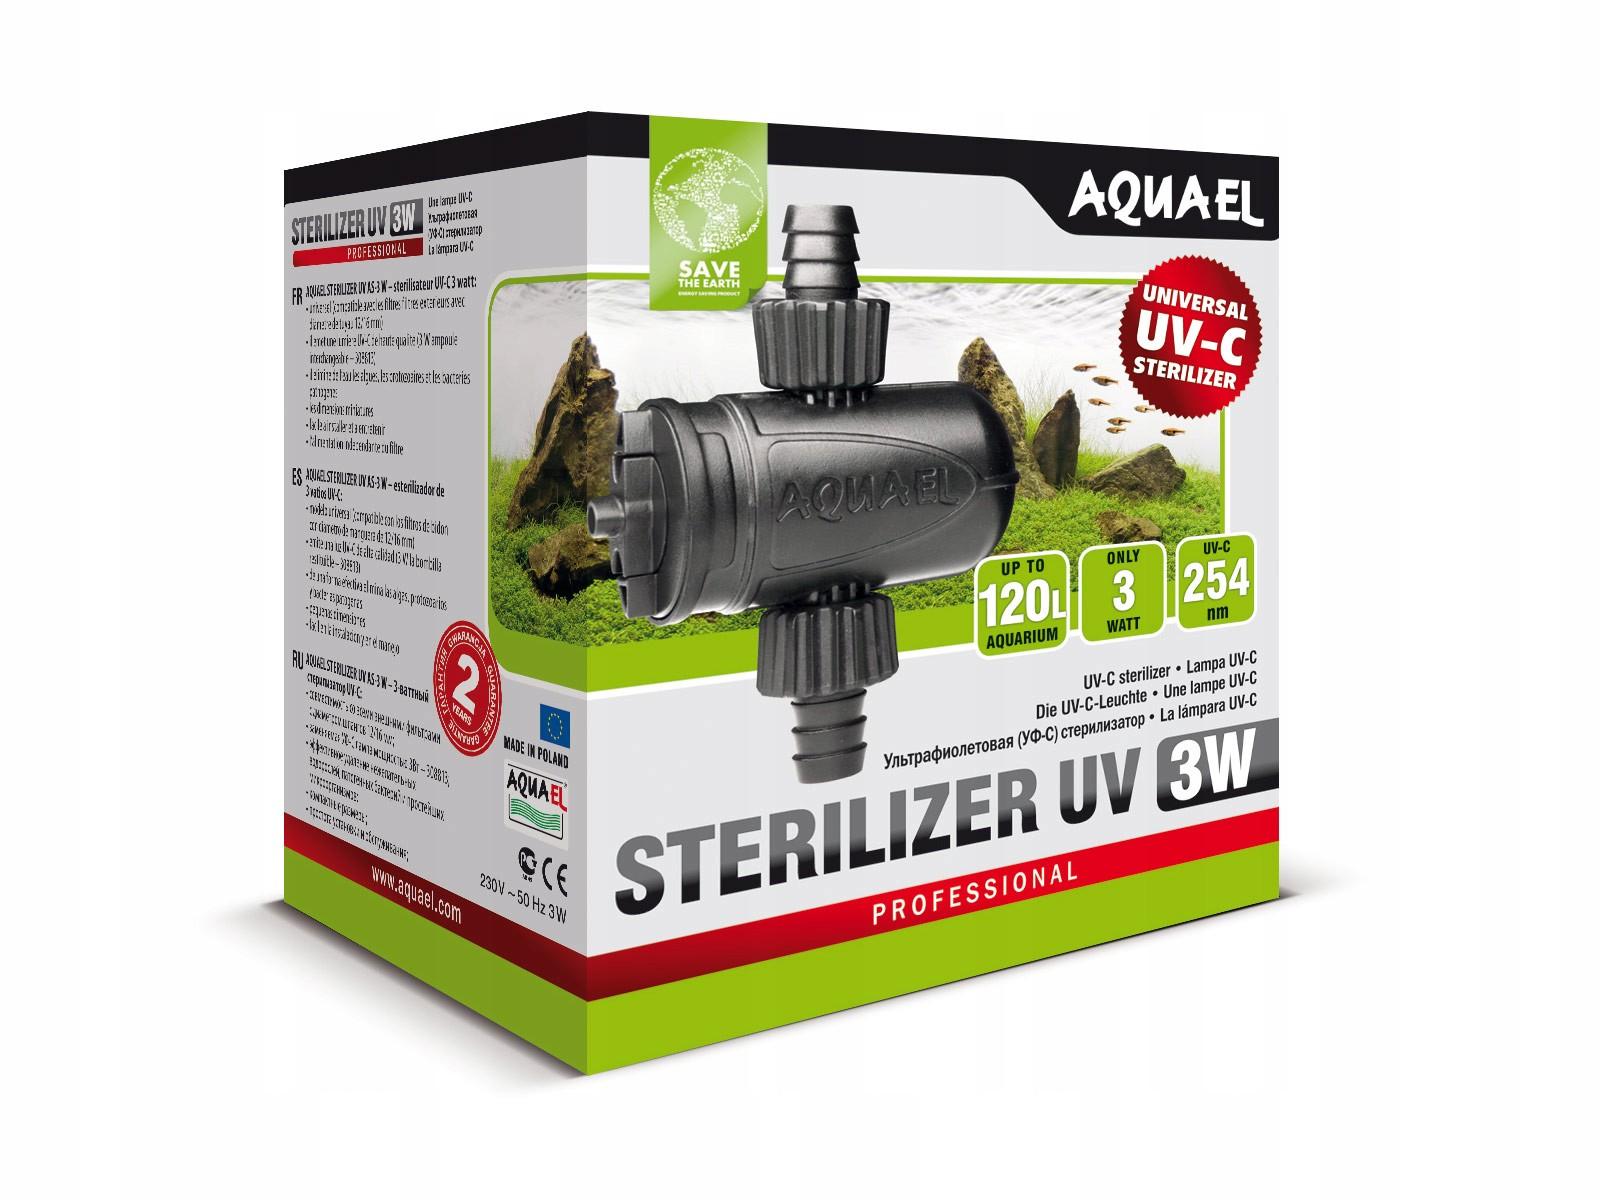 УФ-C - AQUAEL лампа AS-3W-УФ-стерилизатор длина 12 см